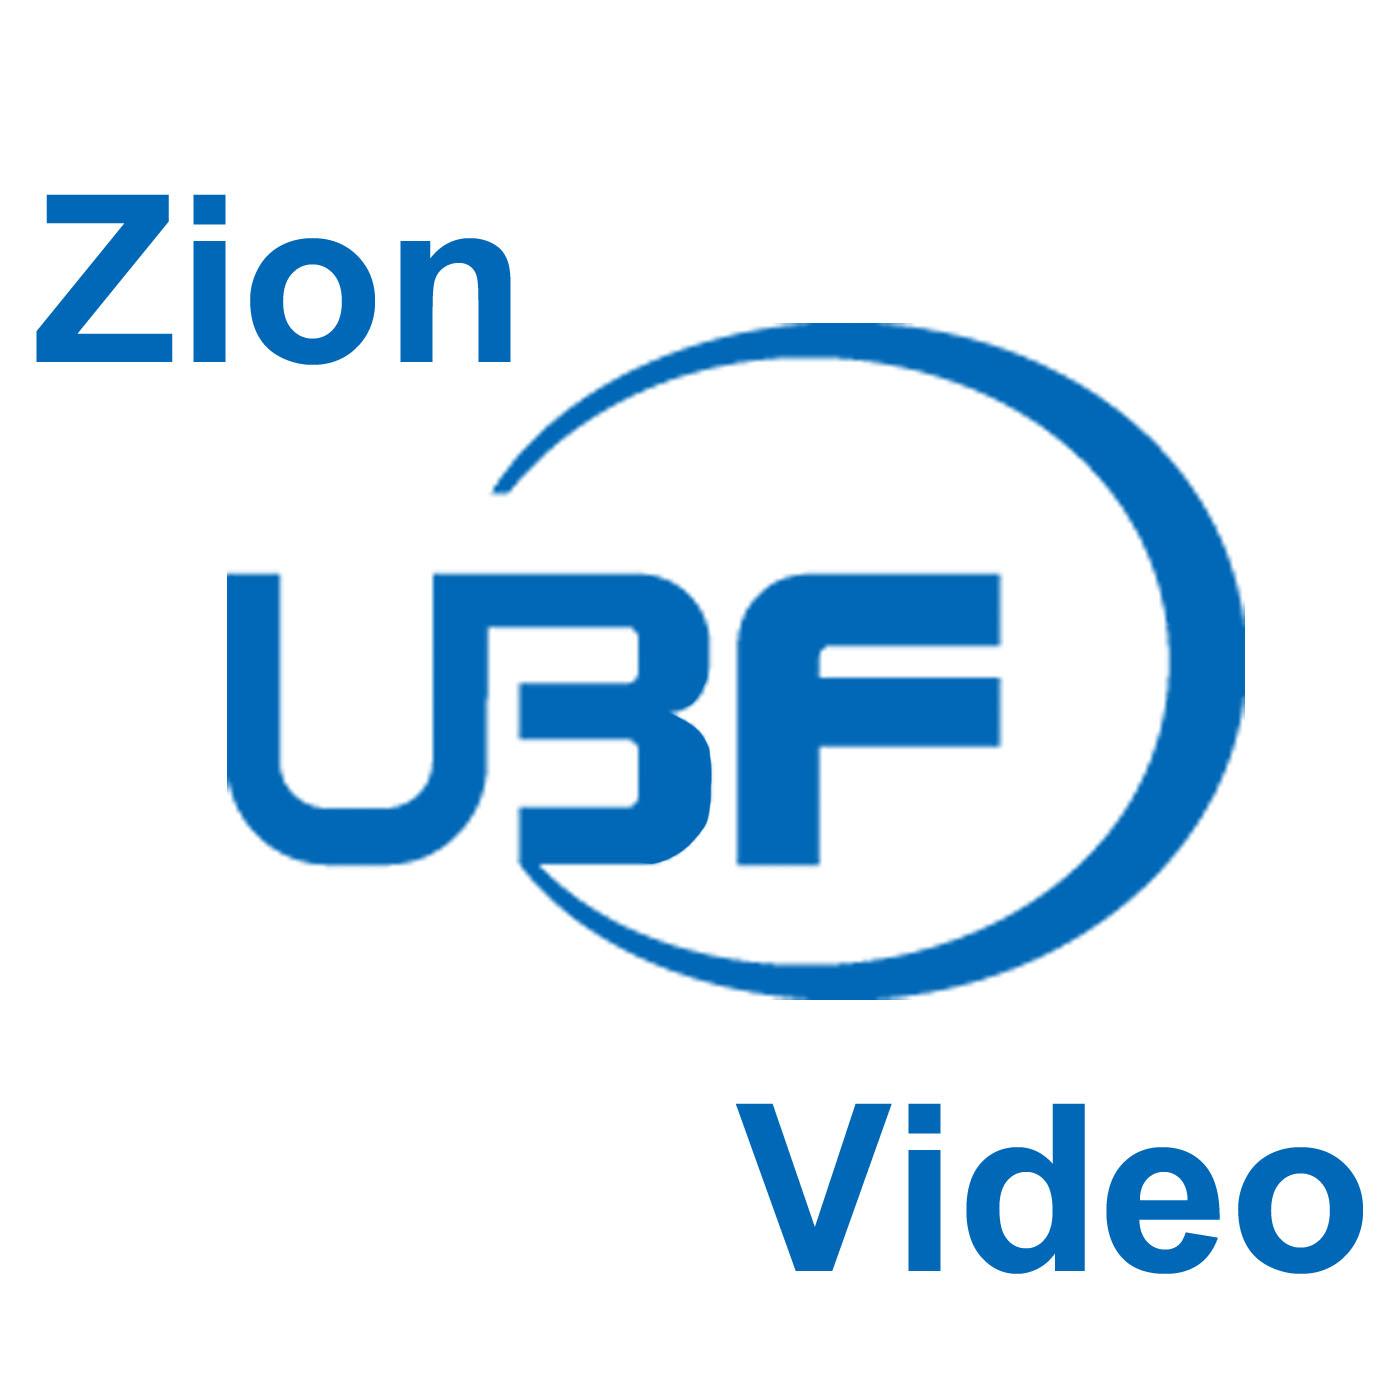 Zion UBF - Video